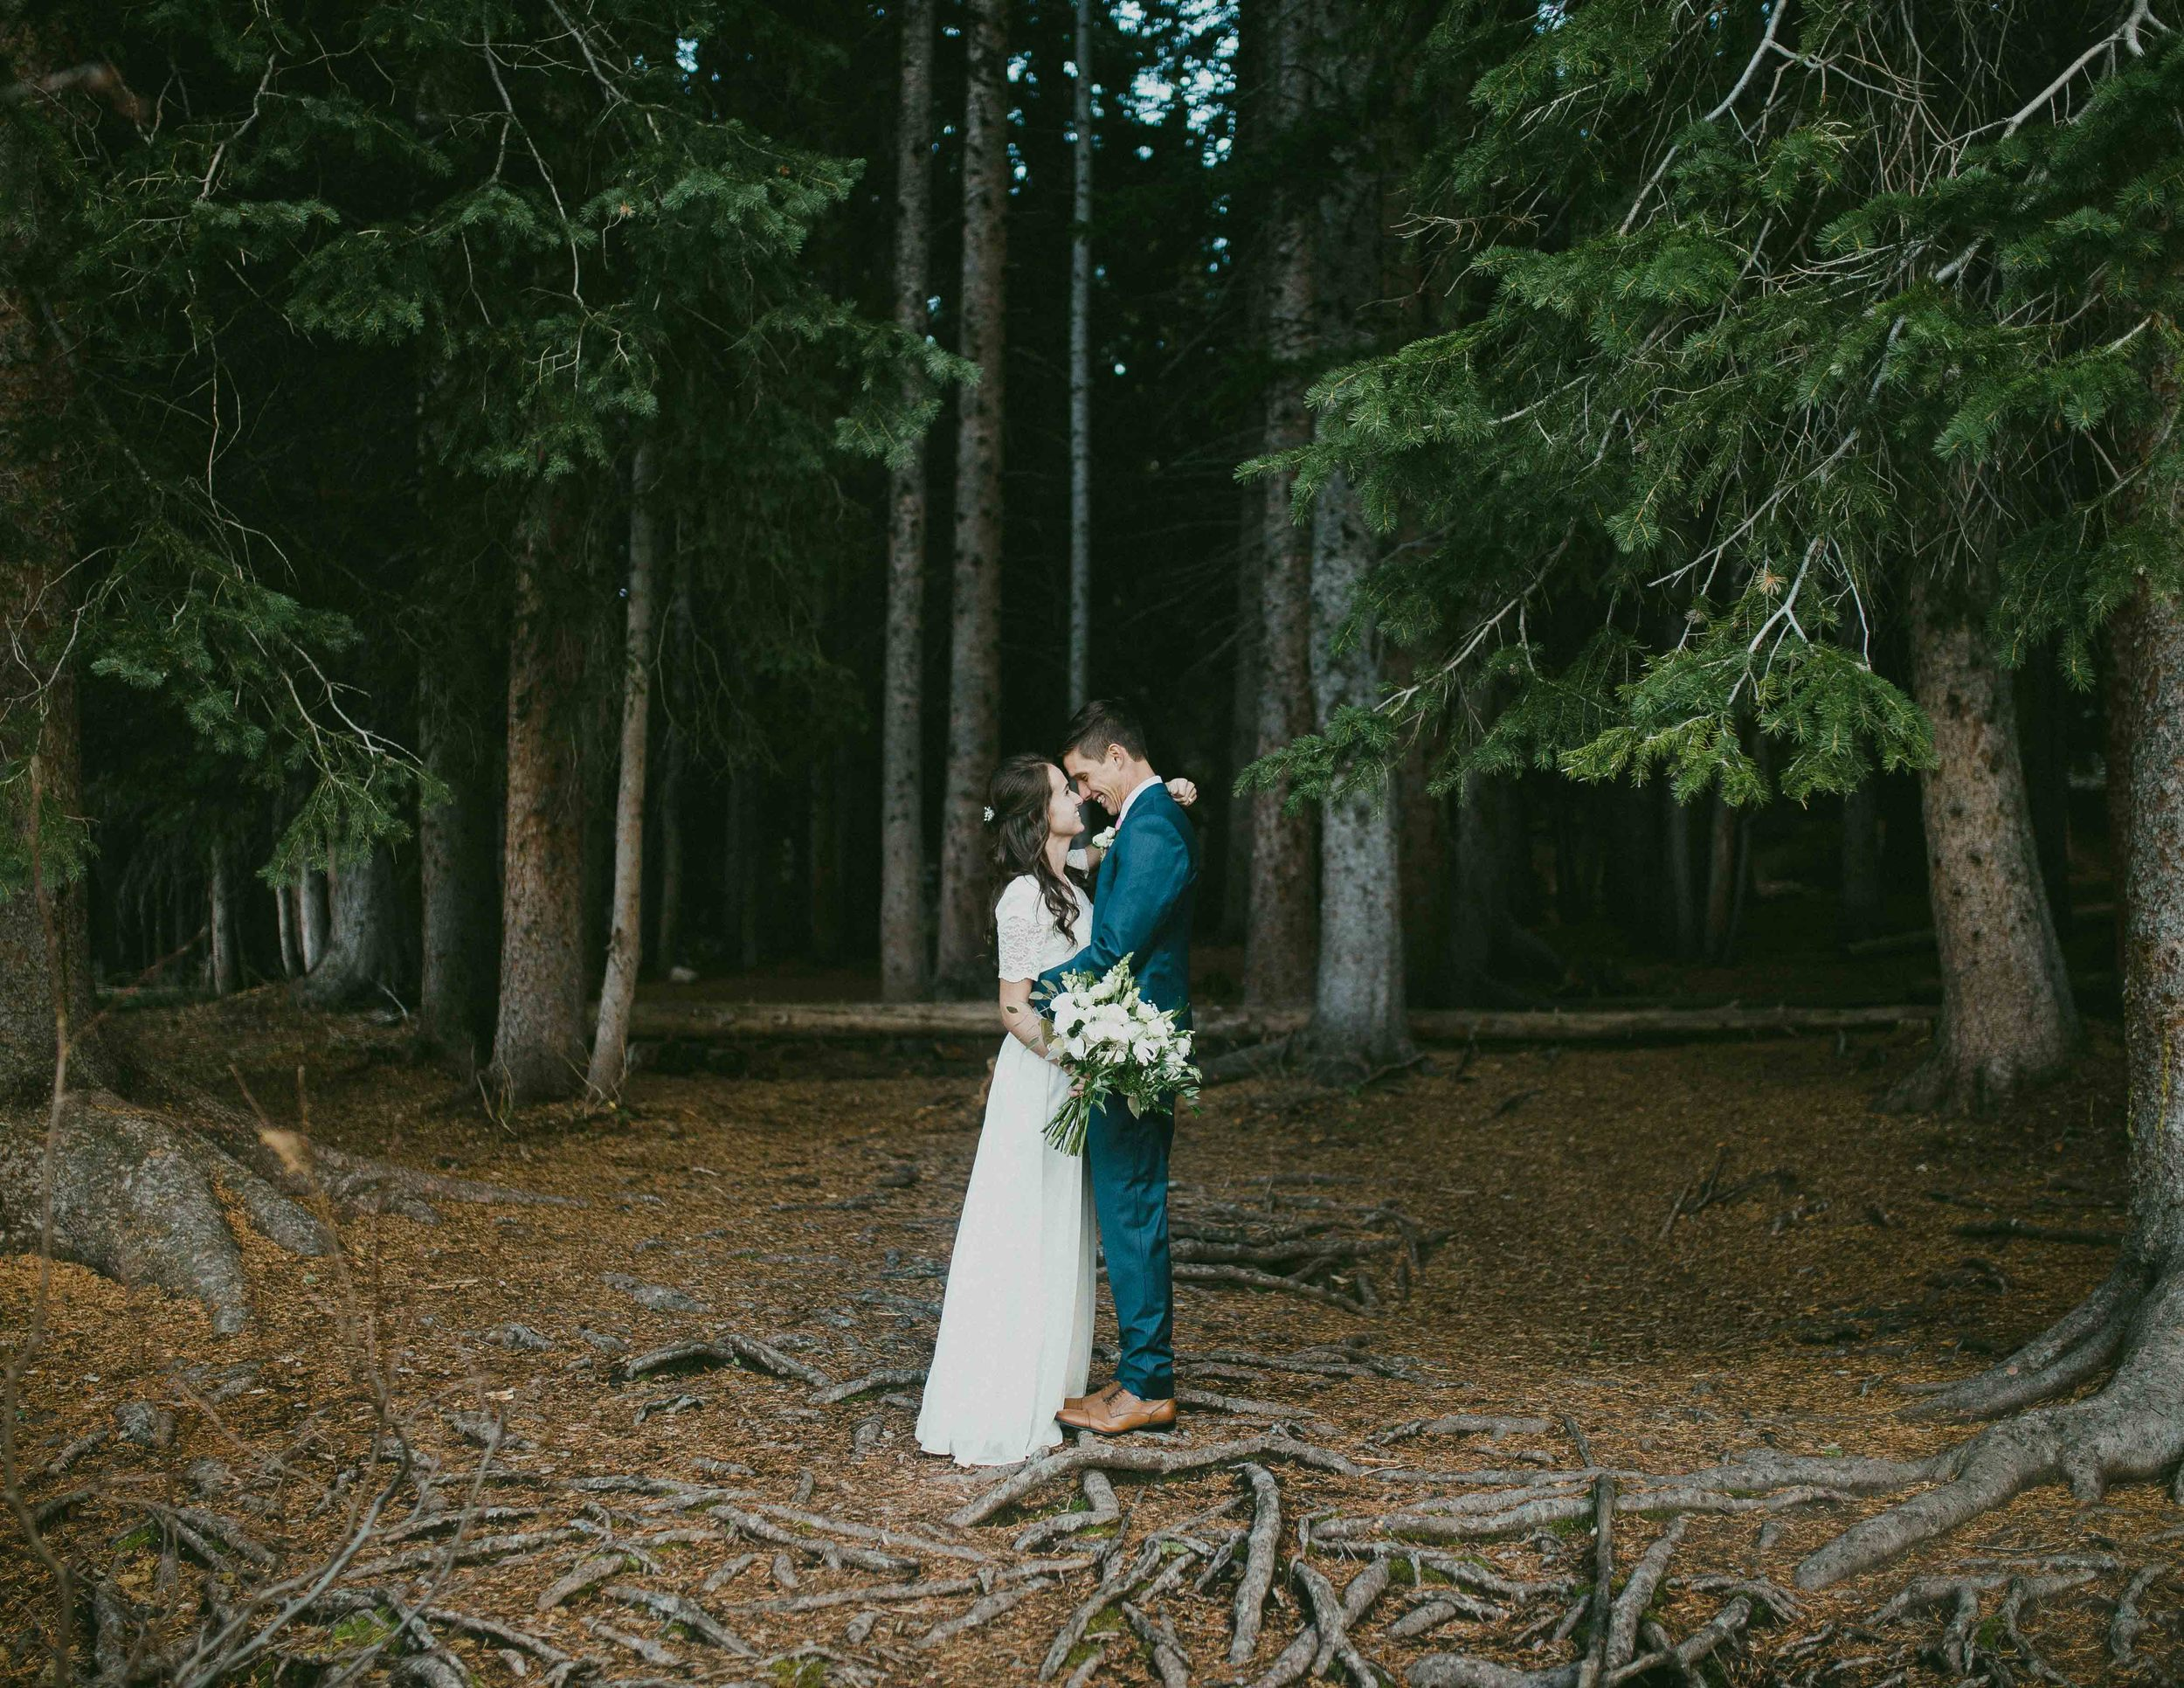 Salt-Lake-City-Wedding-Photographer-1-10.jpg